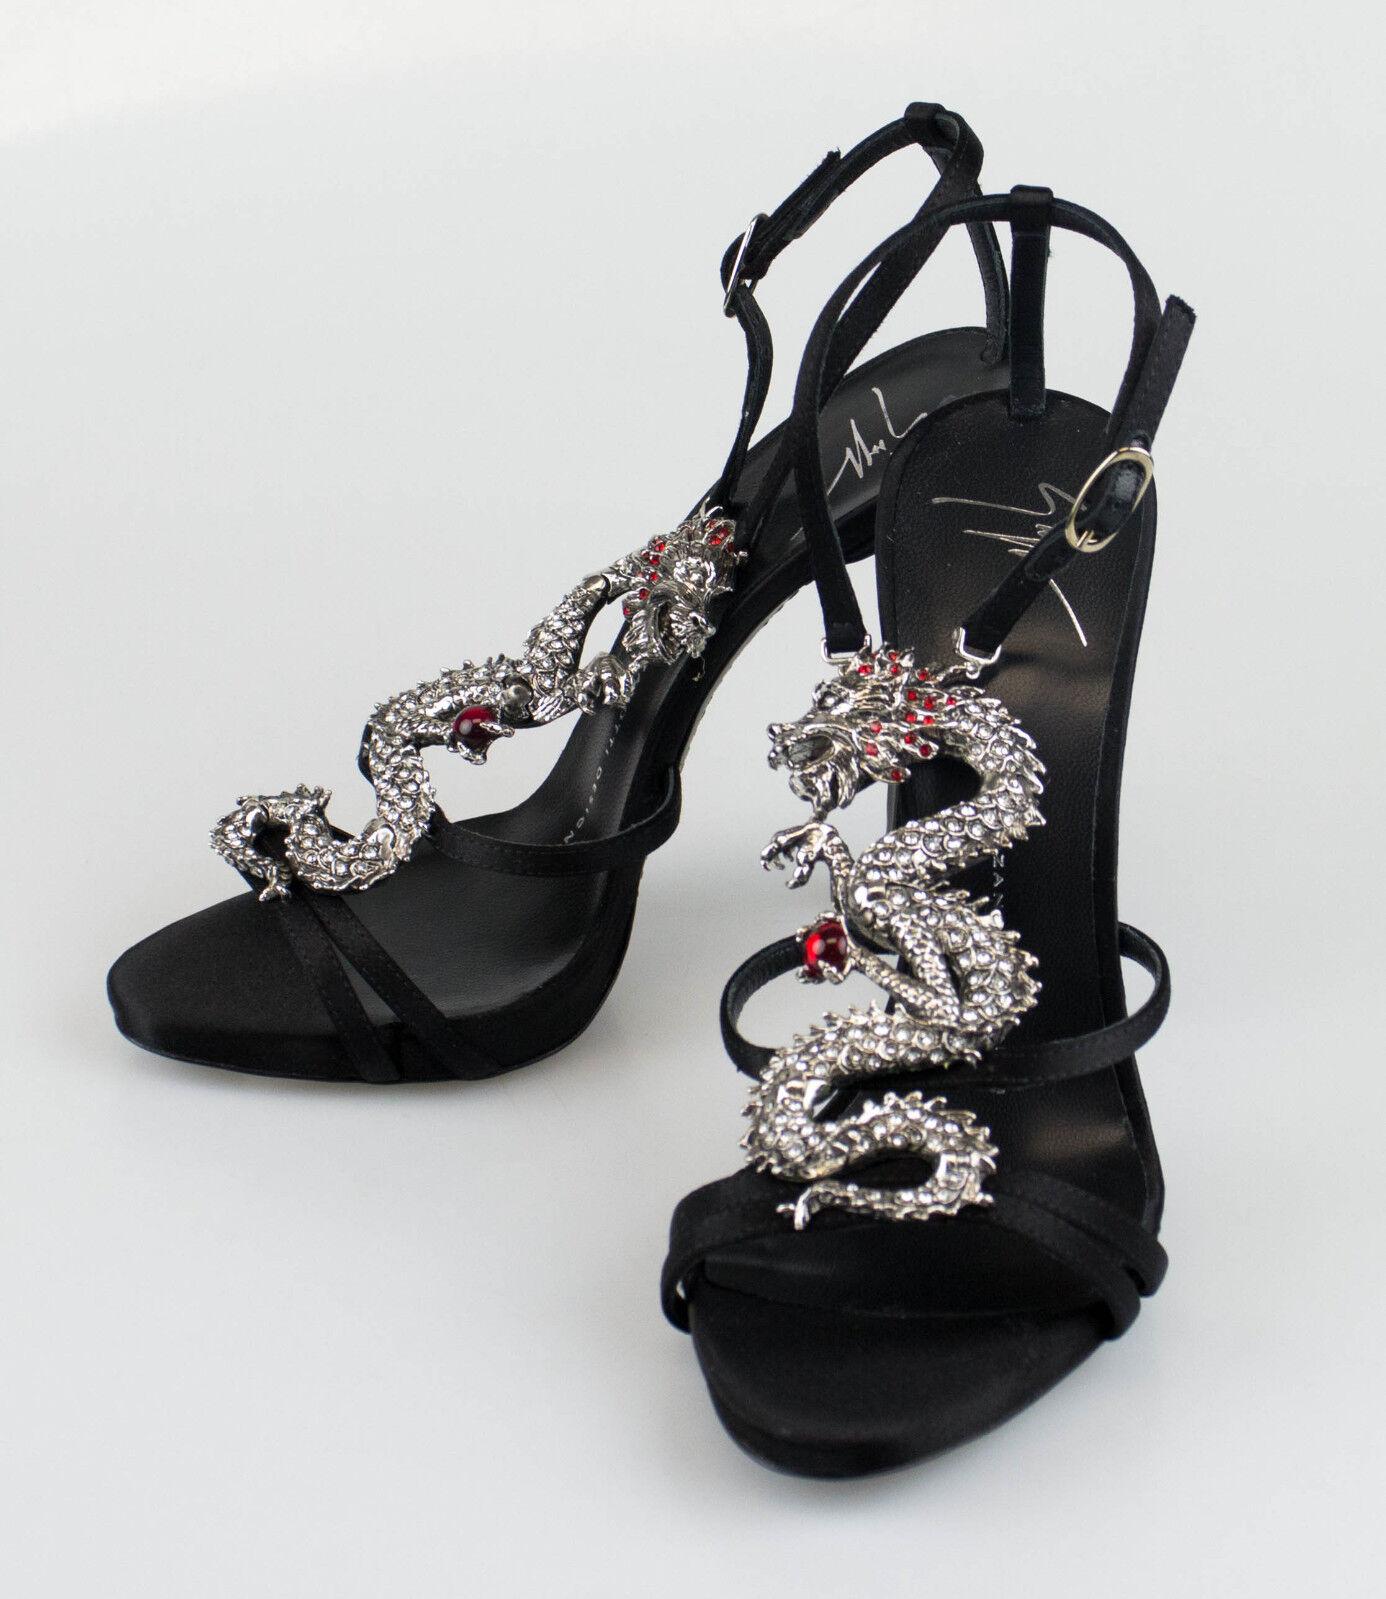 New. GIUSEPPE ZANOTTI Coline Raso Doppiato Heels shoes Size Size Size 8 US 38 EU  1750 d89ad7